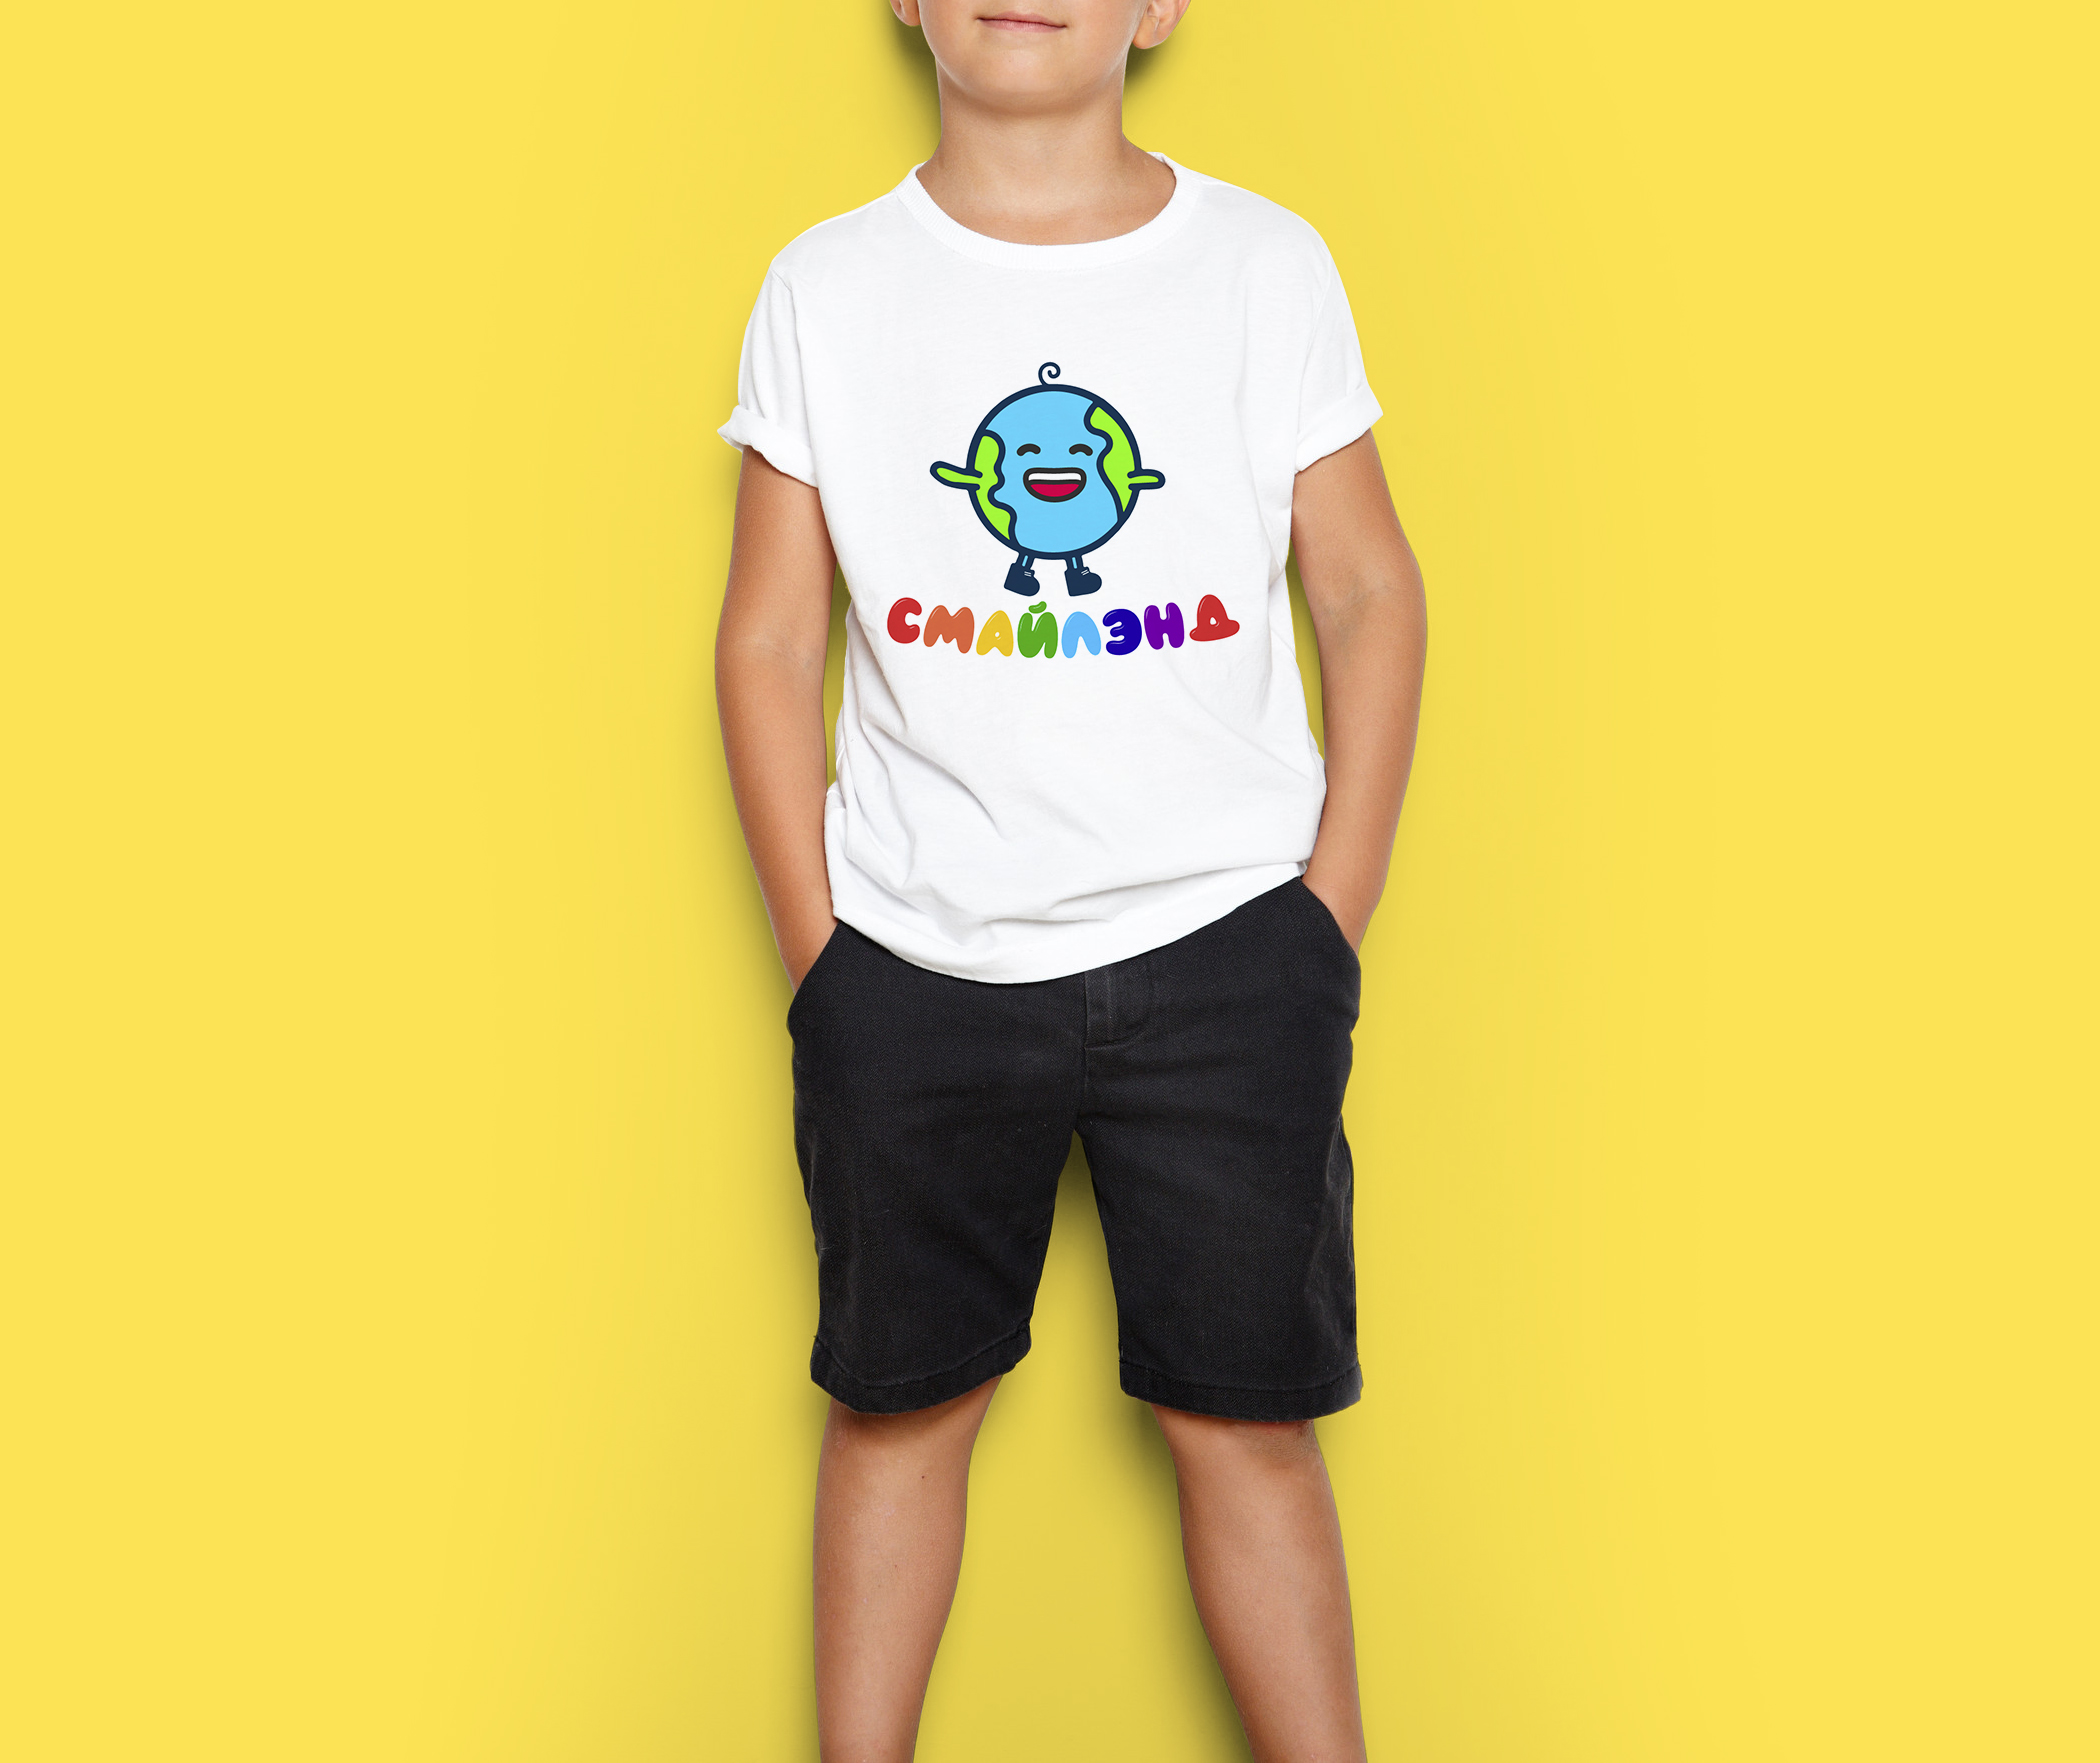 Логотип, стиль для детского игрового центра. фото f_2515a3df63b8c281.jpg